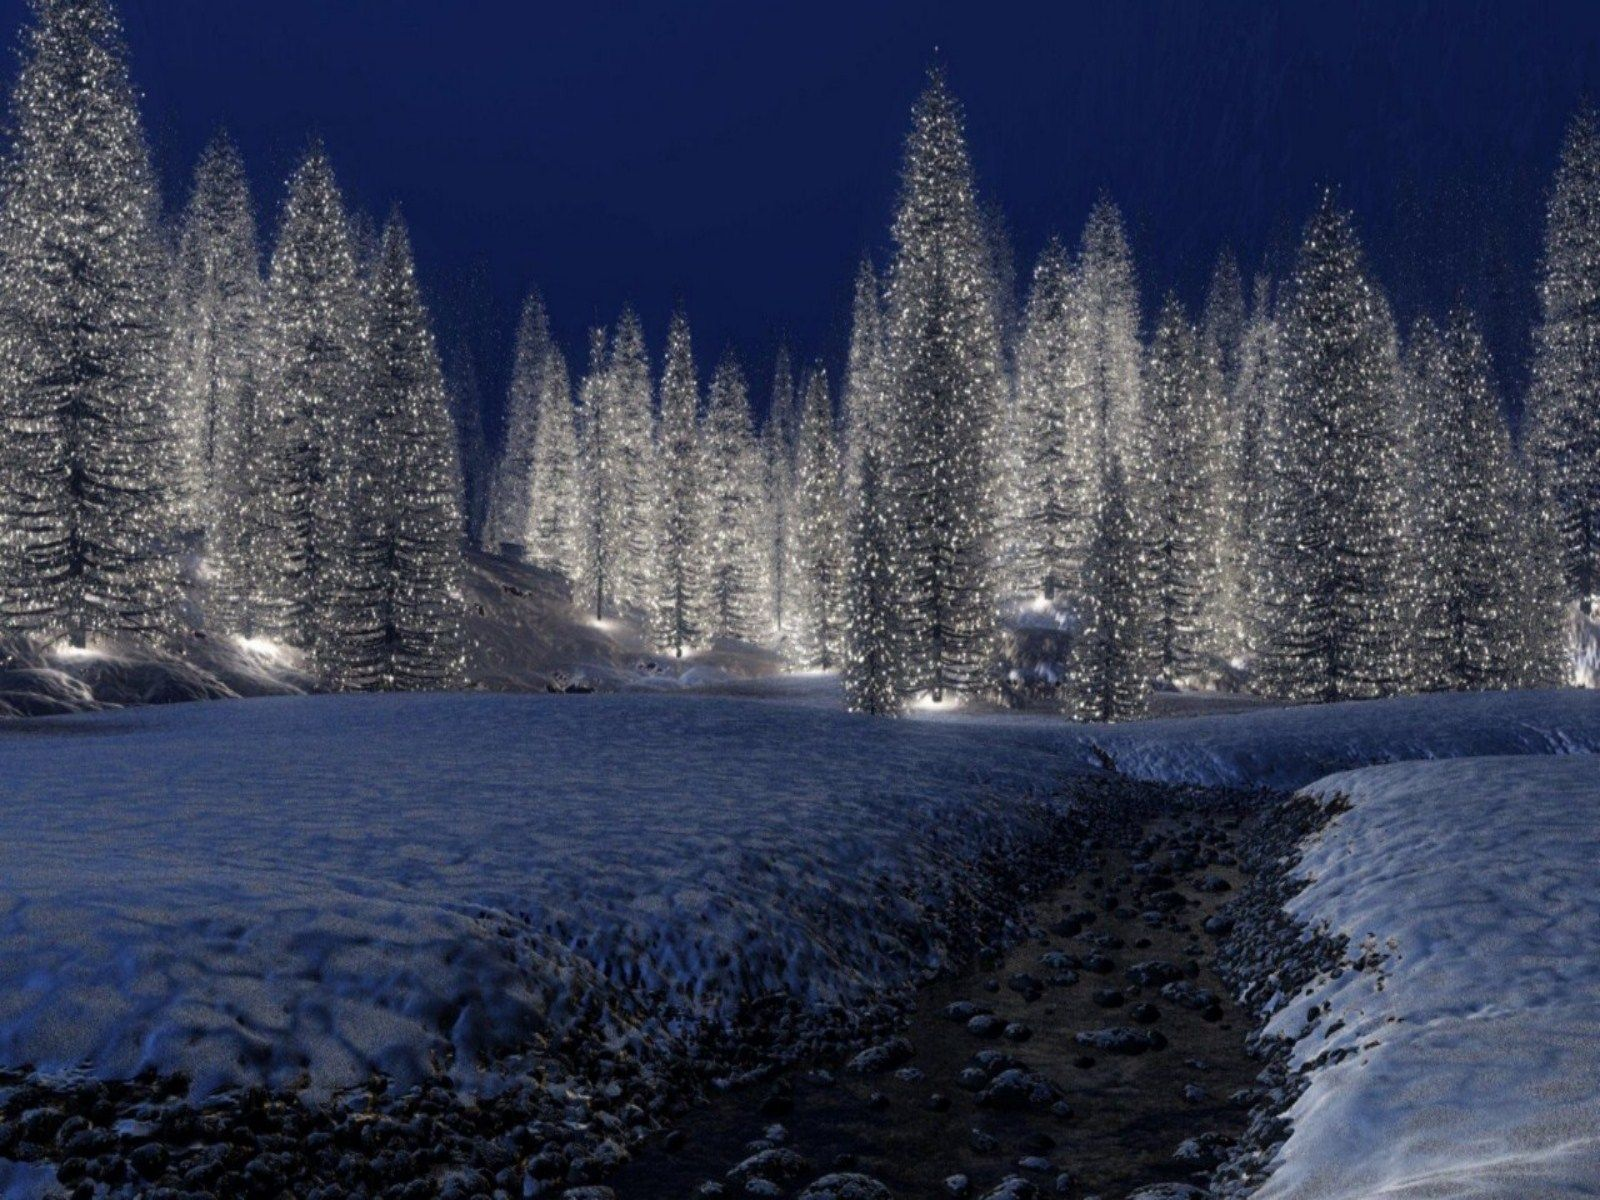 christmas scenery Download HD Snowy Christmas Scene 1600x1200